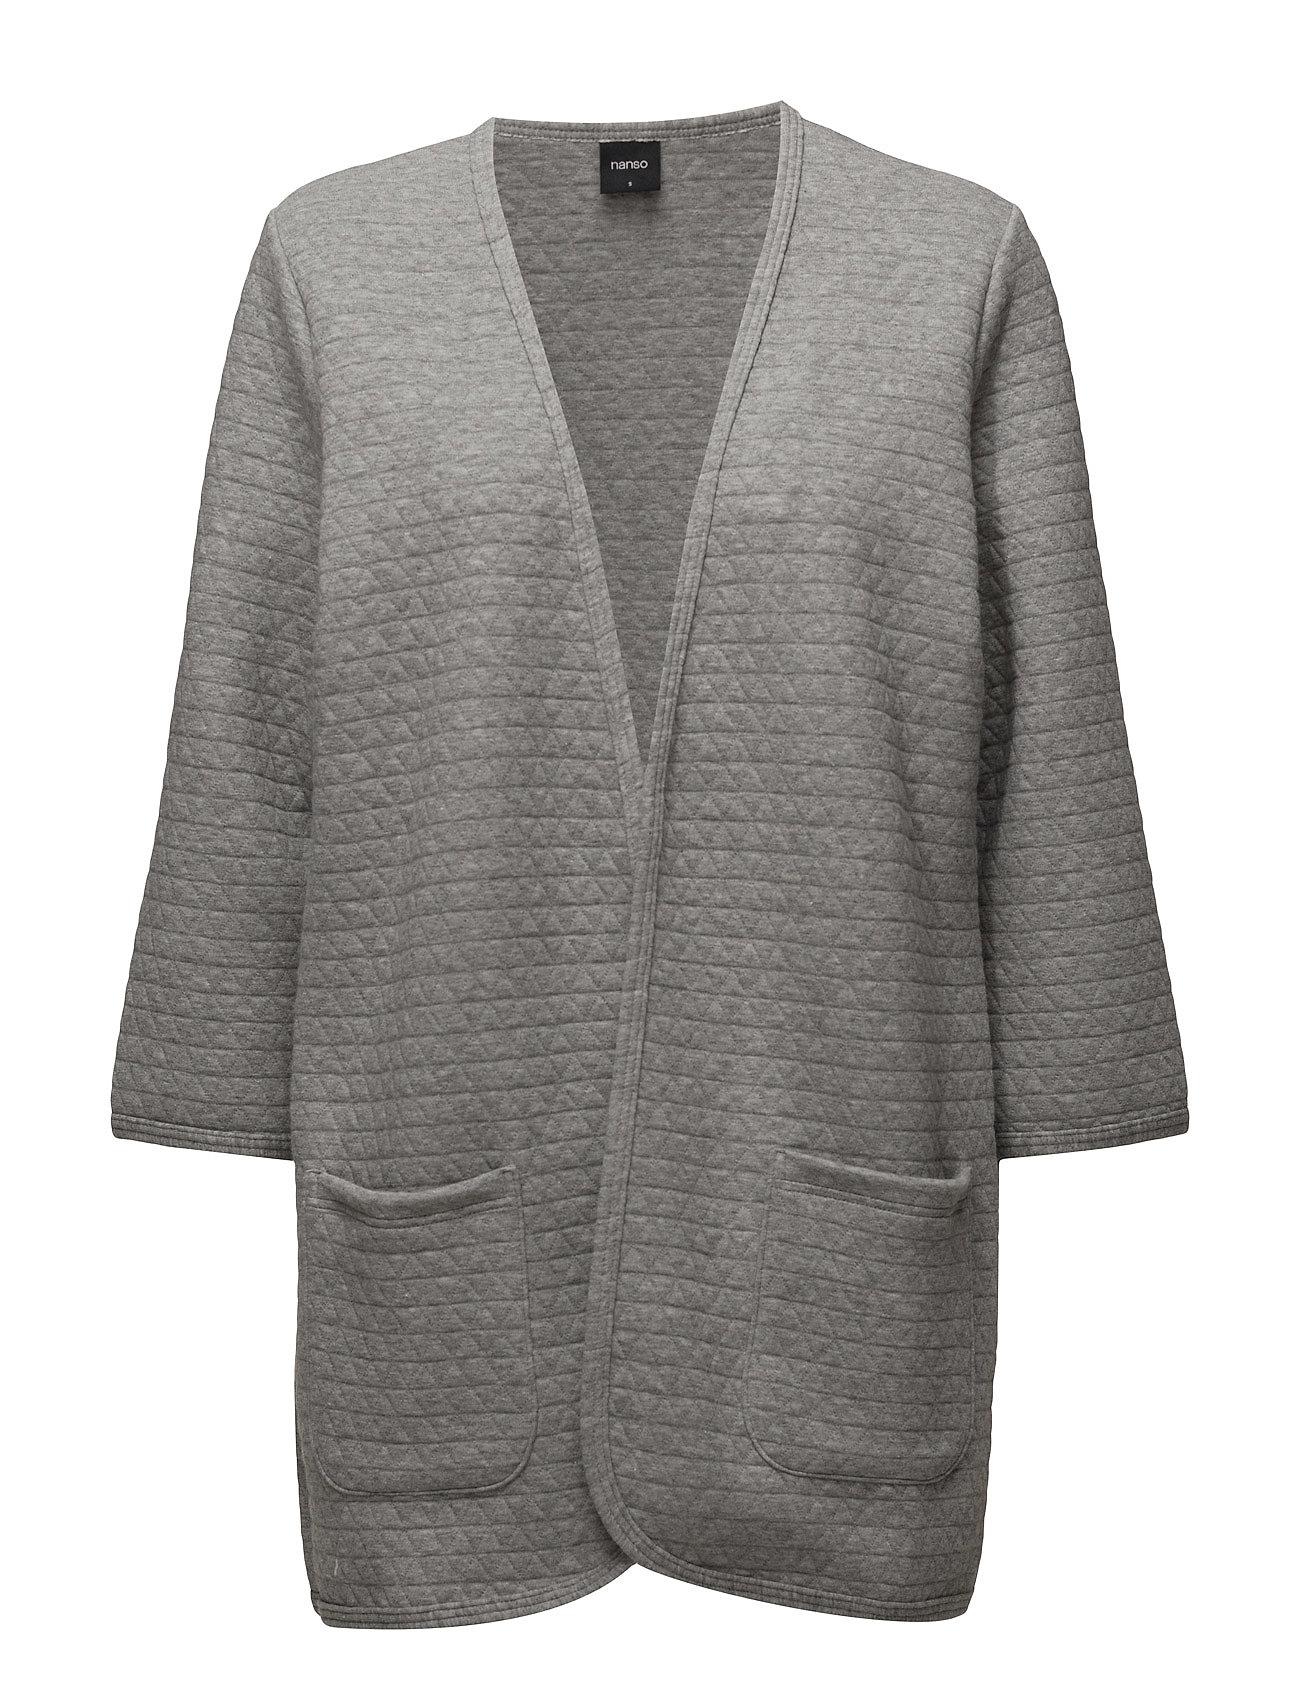 Ladies Cardigan, Nokkela (Grey Melange) (£82.20) - Nanso | Boozt.com